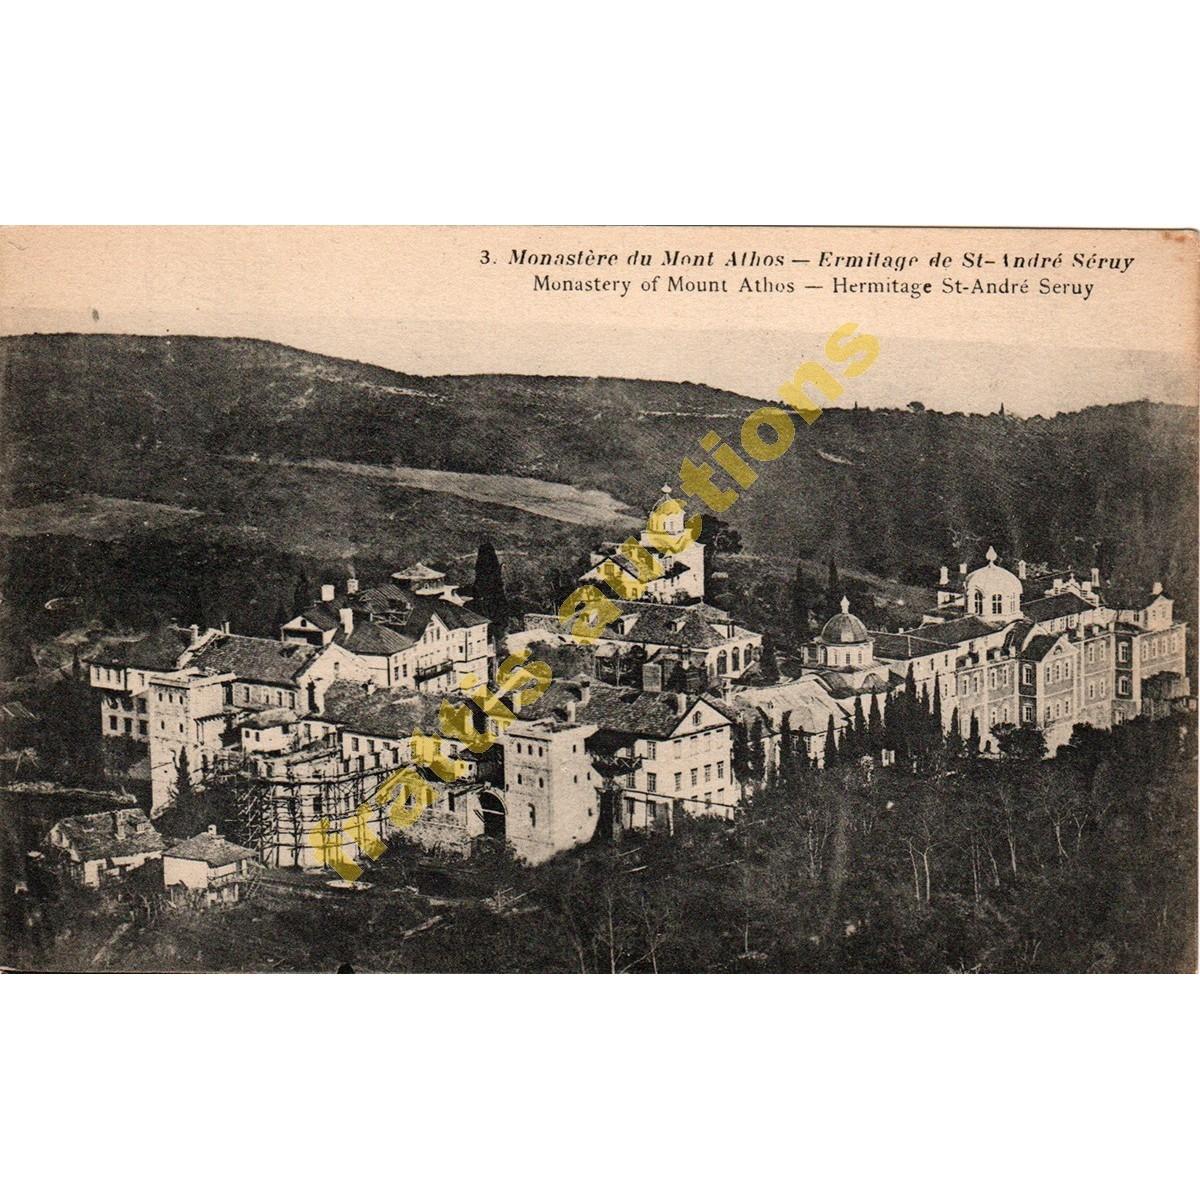 MONASTERY OF MOUNT ATHOS - HERMITAGE St. ANDRE SERUY, Baudiniere, Paris, 3